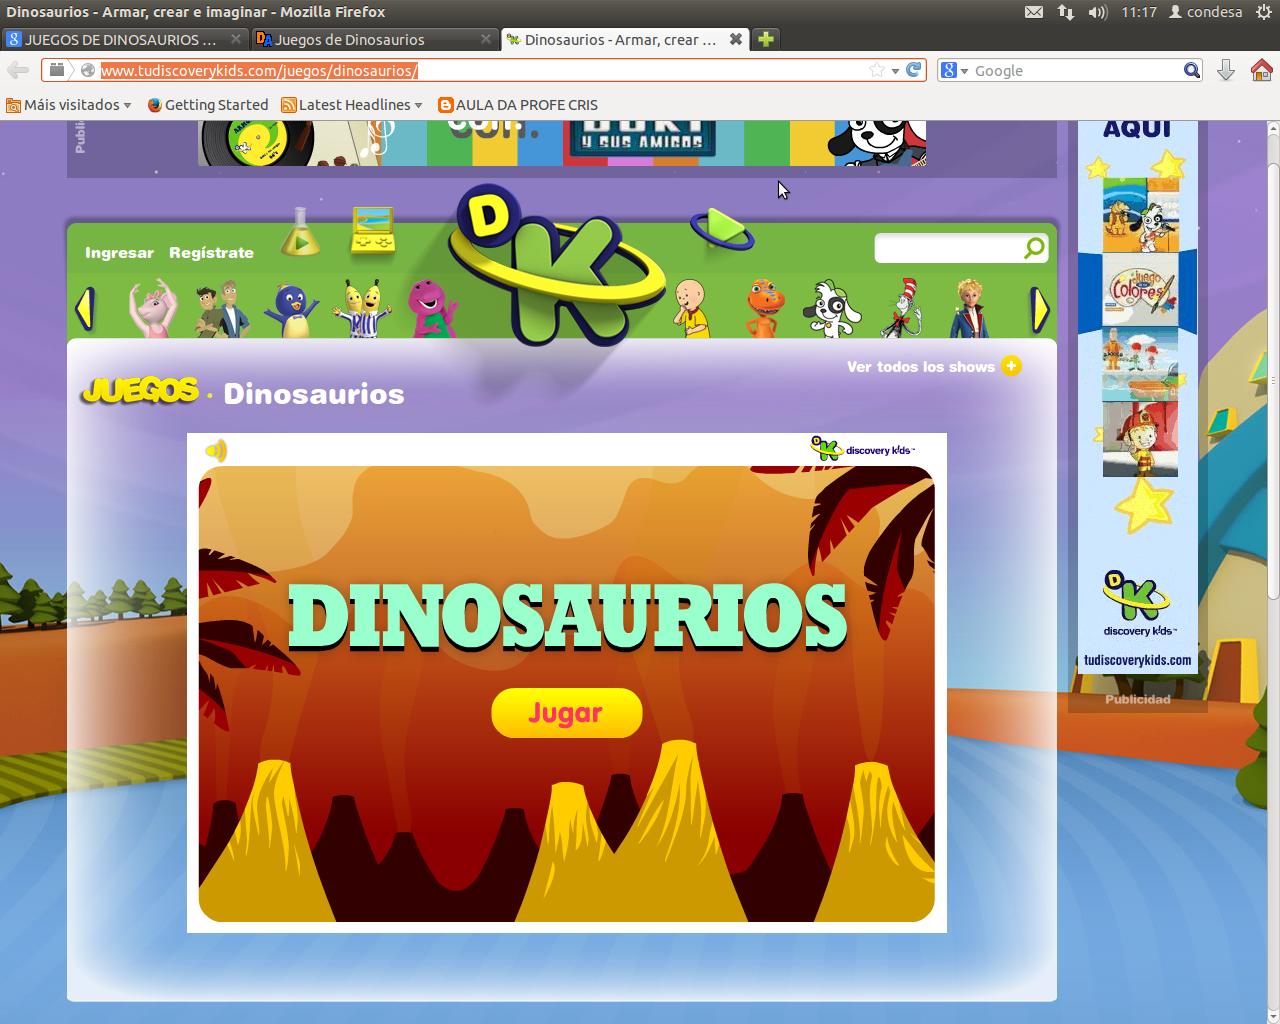 http://www.tudiscoverykids.com/juegos/dinosaurios/